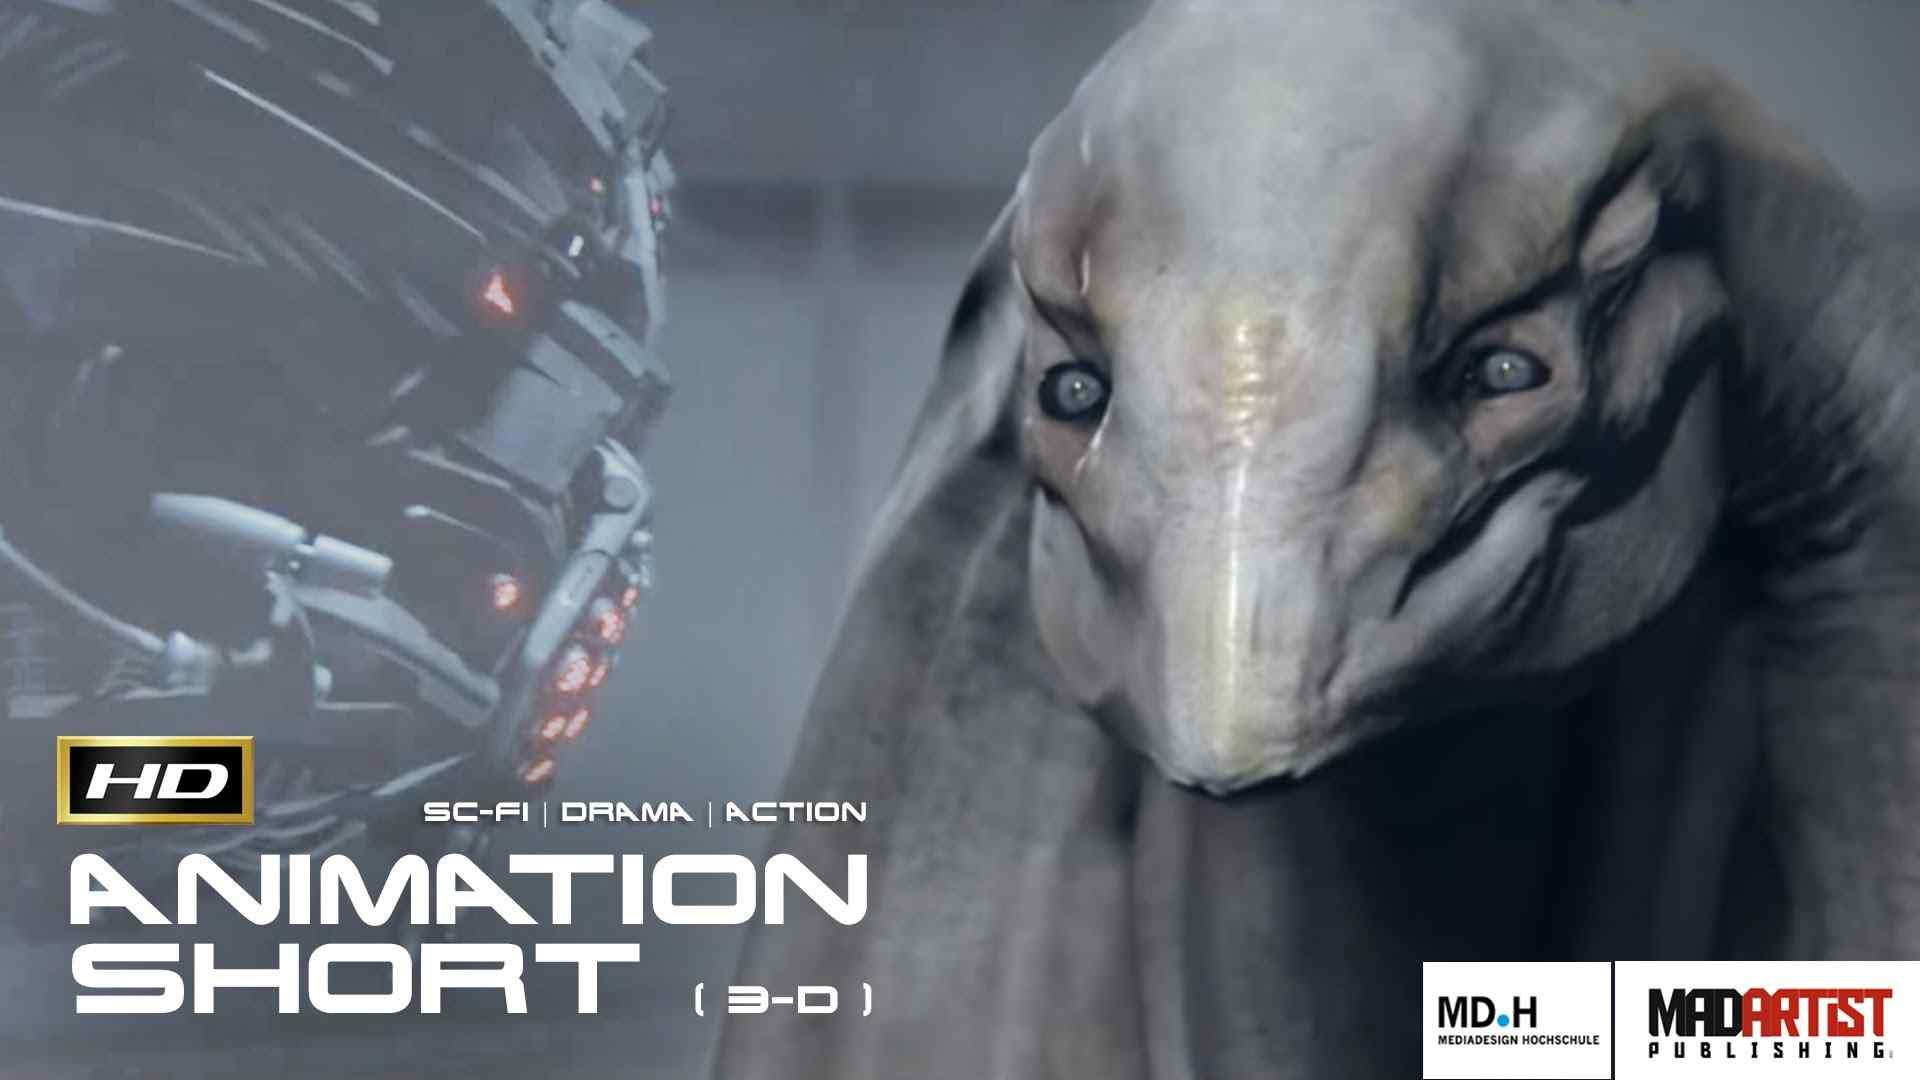 rha-alien-vs-machine-fantastic-sci-fi-cgi-3d-animation-short-film-by-kaleb-lechowski-illustrationvault